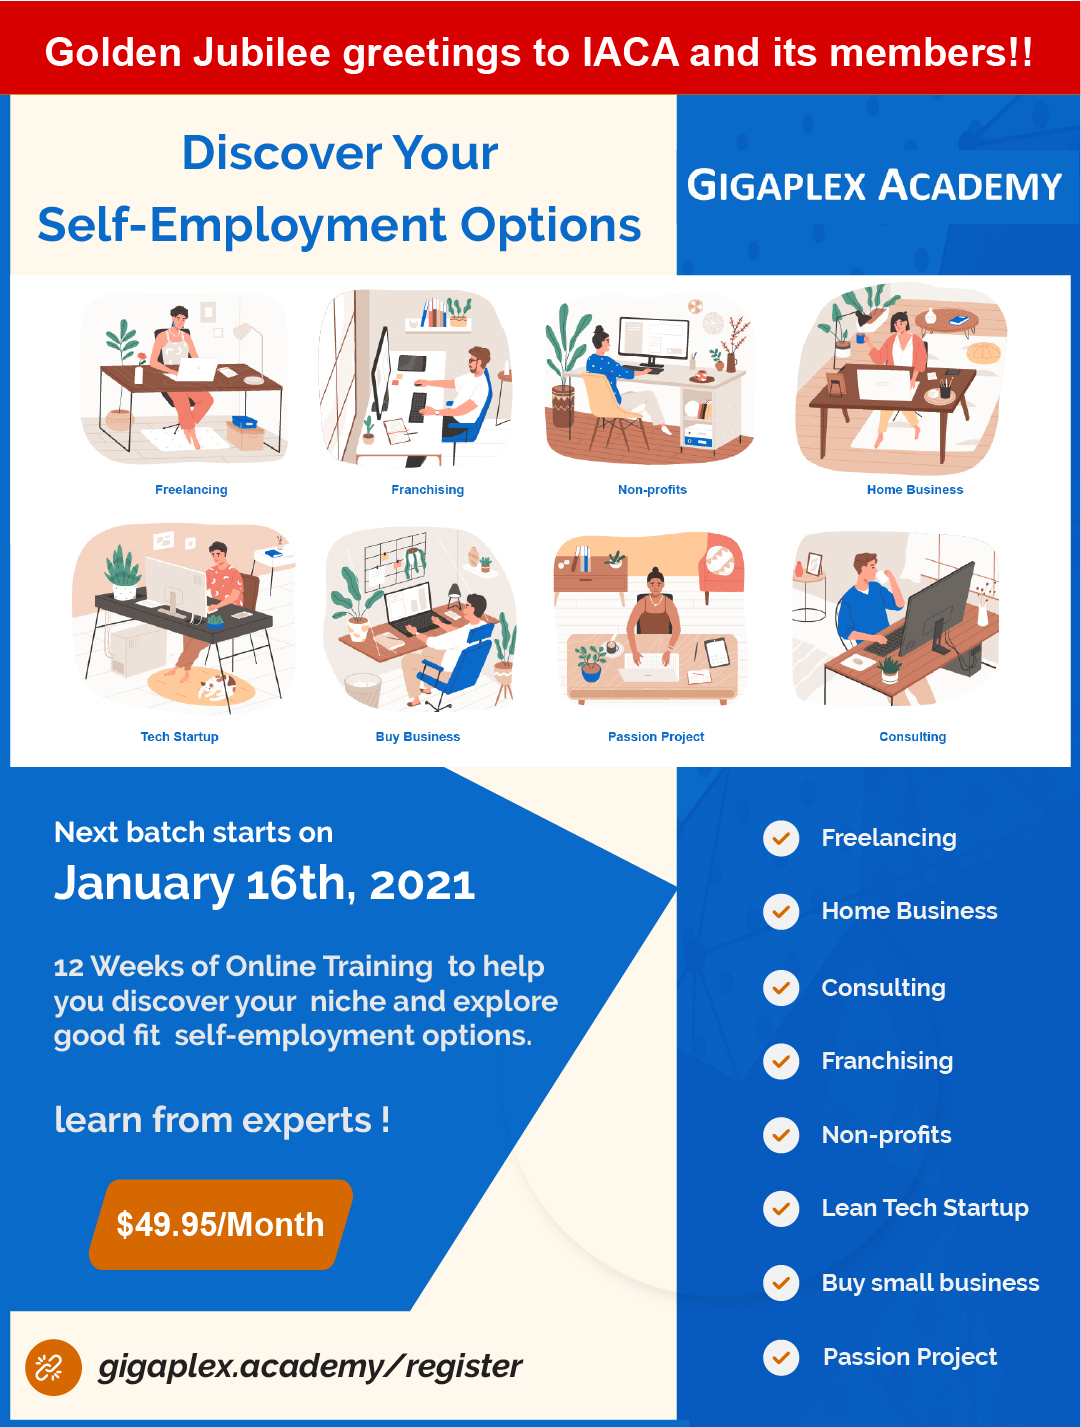 Gigaplex Academy Education